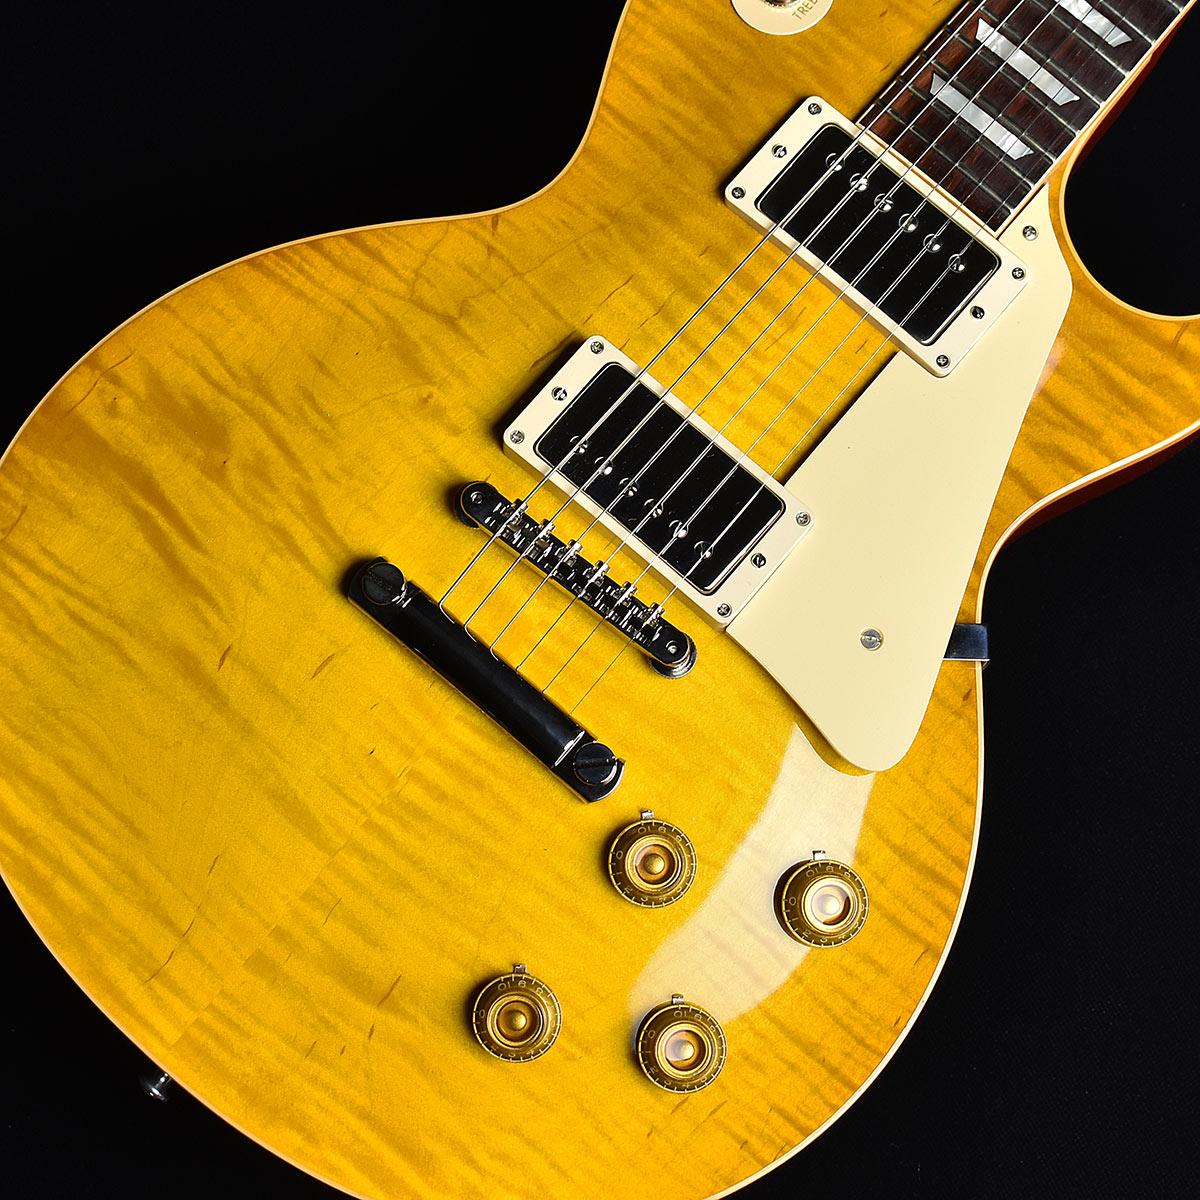 Gibson Custom Shop 1959 Les Paul Standard Honey Lemon Fade Gloss S/N:983641 【ギブソン カスタムショップ】【未展示品】